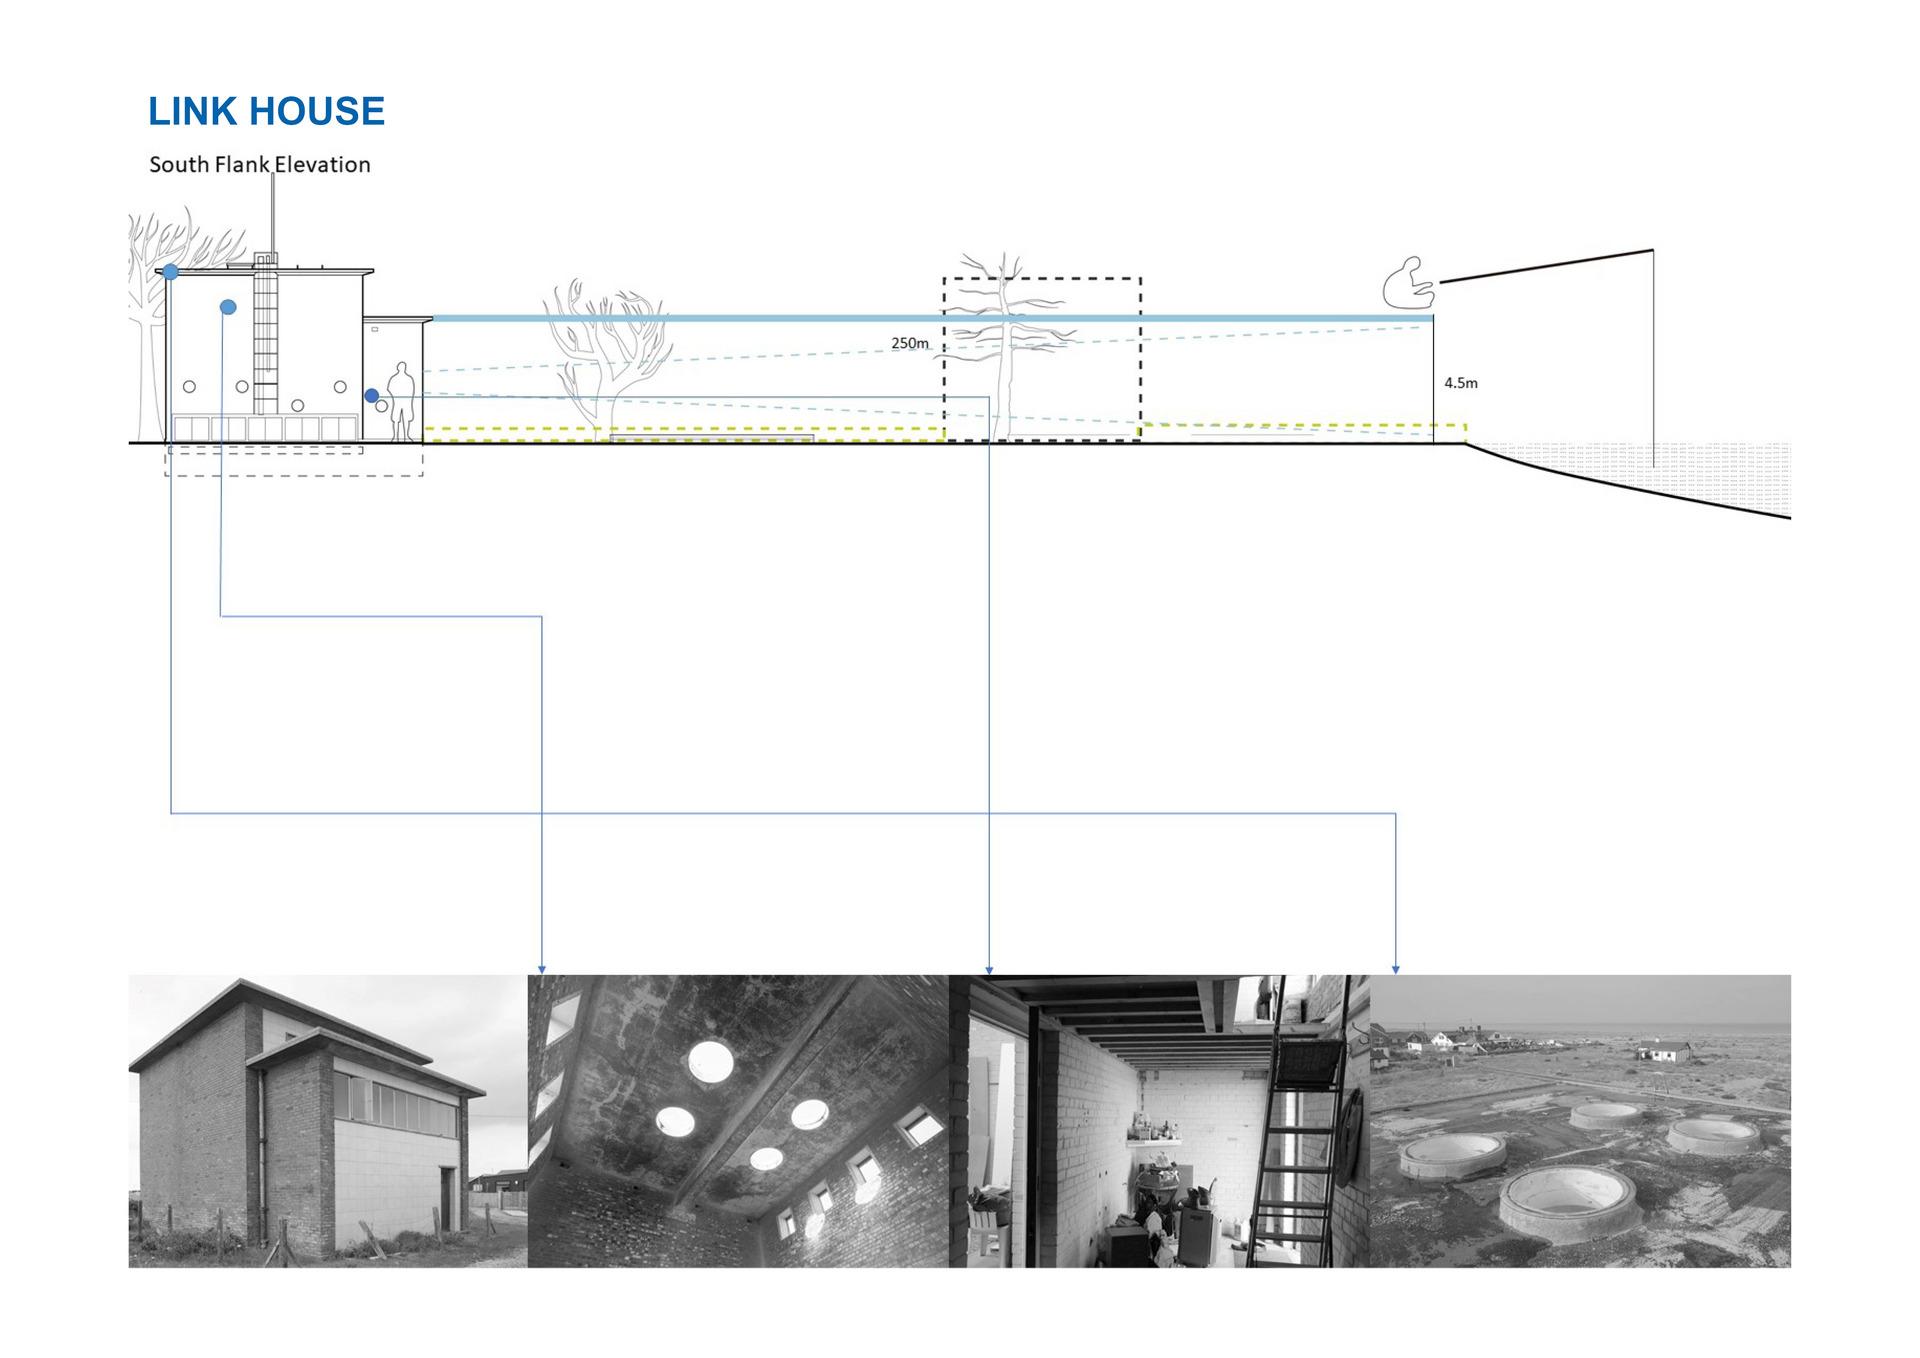 Link House Analysis